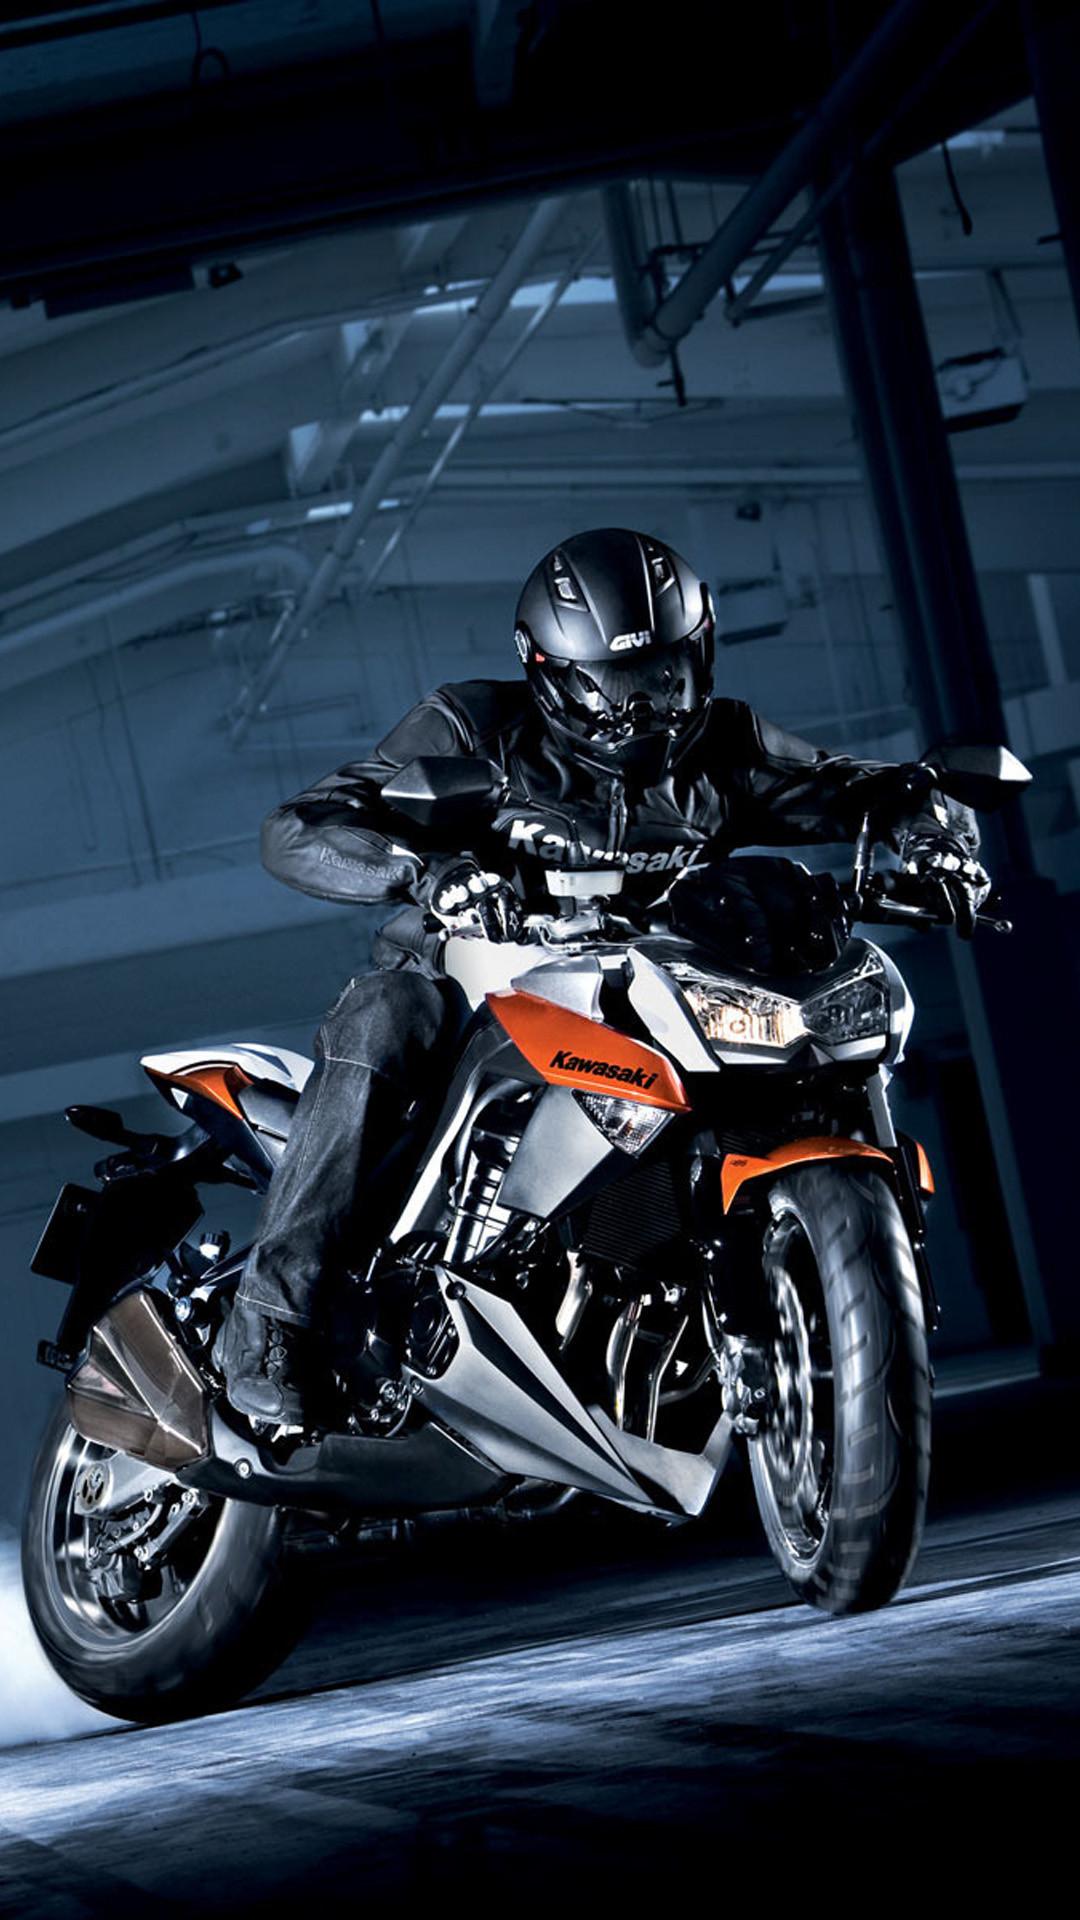 Motorcycle phone wallpaper 76 images - Superbike wallpaper ...